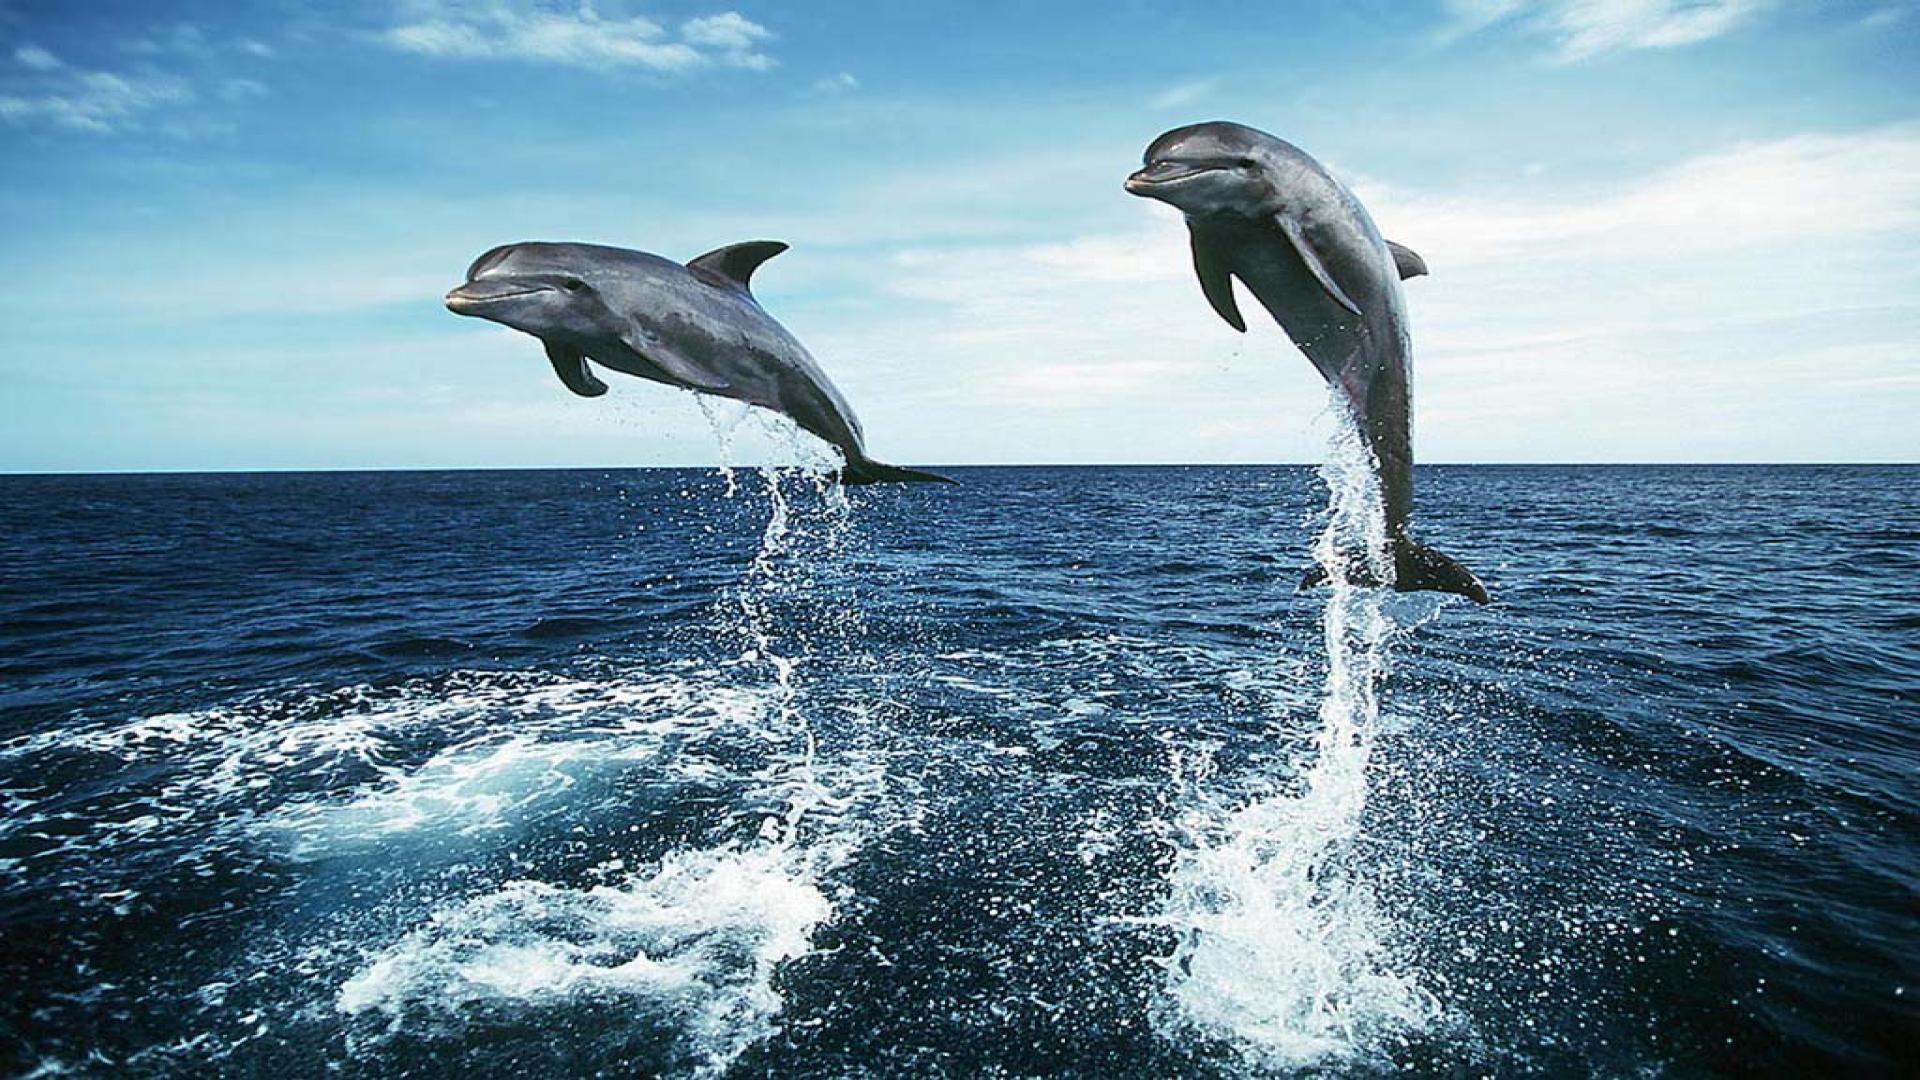 Dolphin Jumping HD Wallpapers - HD Wallpapers Inn